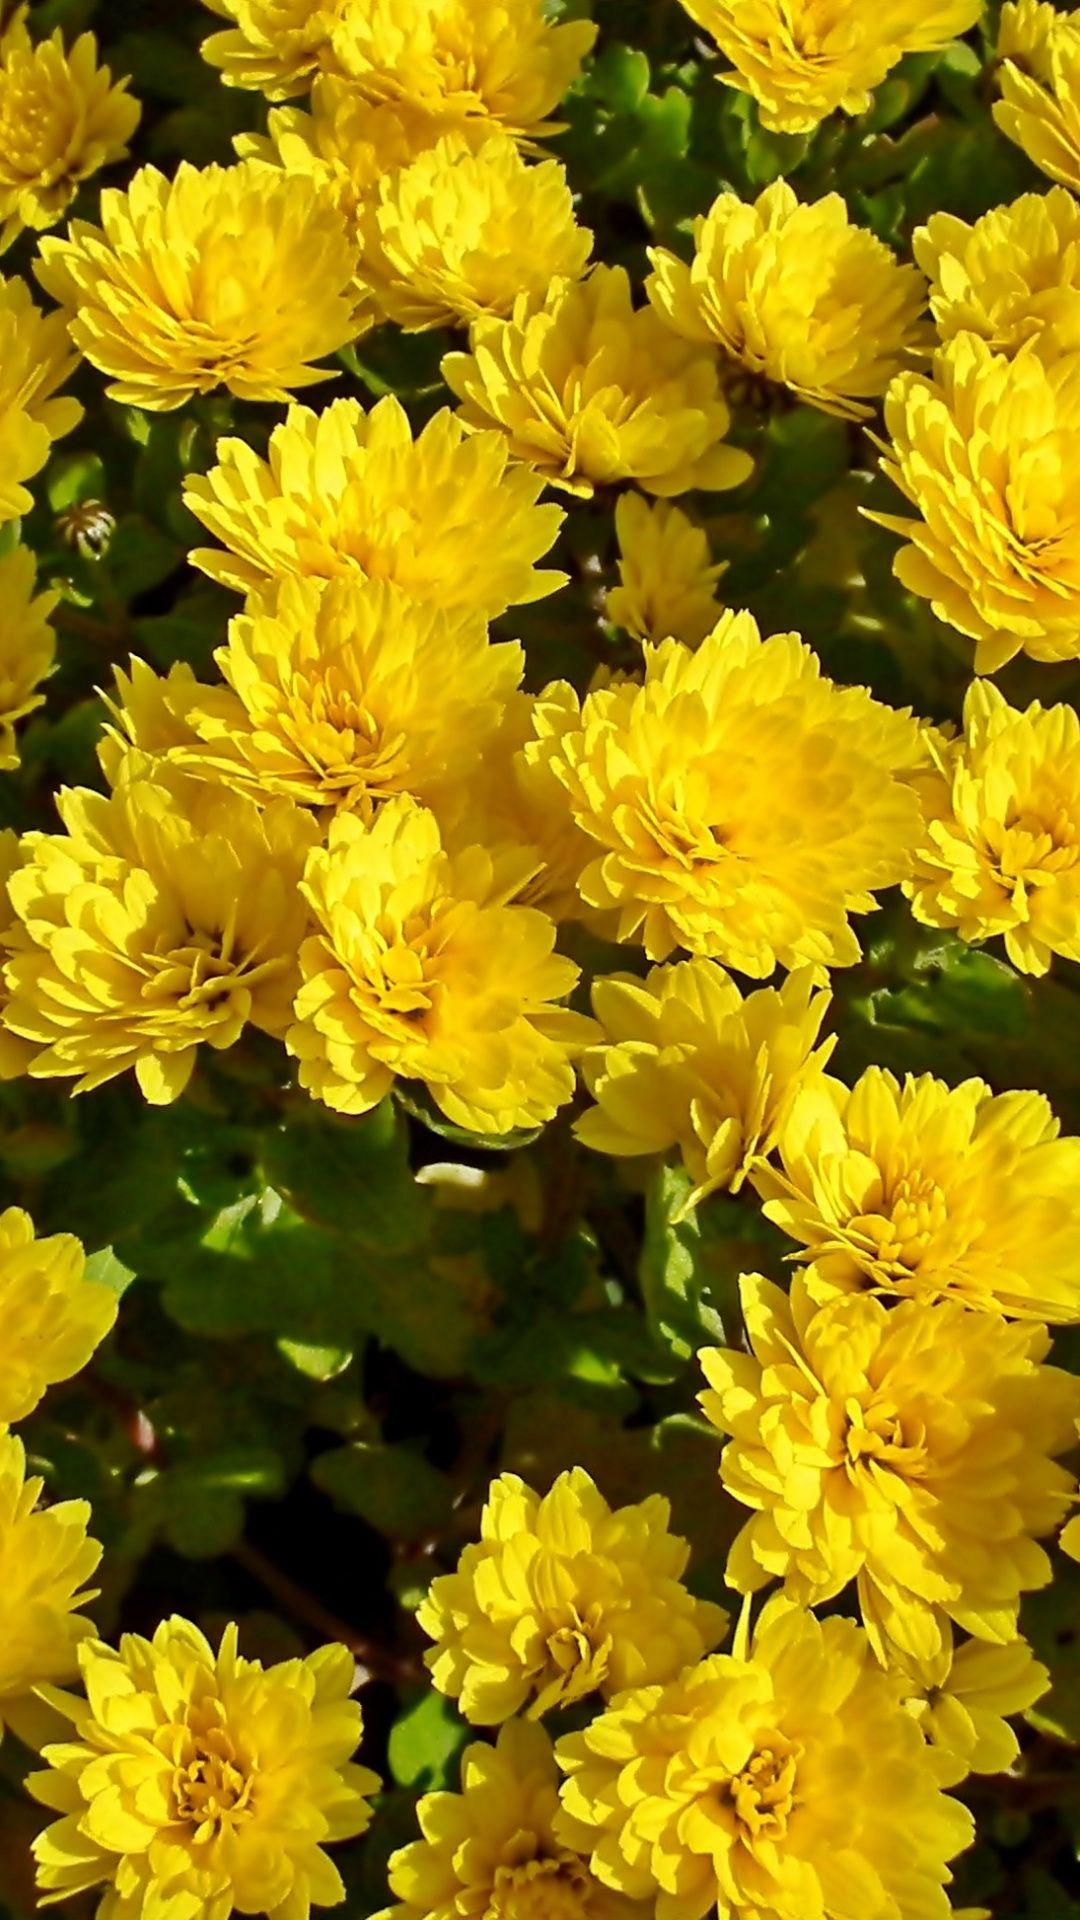 Chrysanthemum Yellow Flowers Bloom 1080x1920 Wallpaper Yellow Flower Wallpaper Yellow Flowers Chrysanthemum Flower